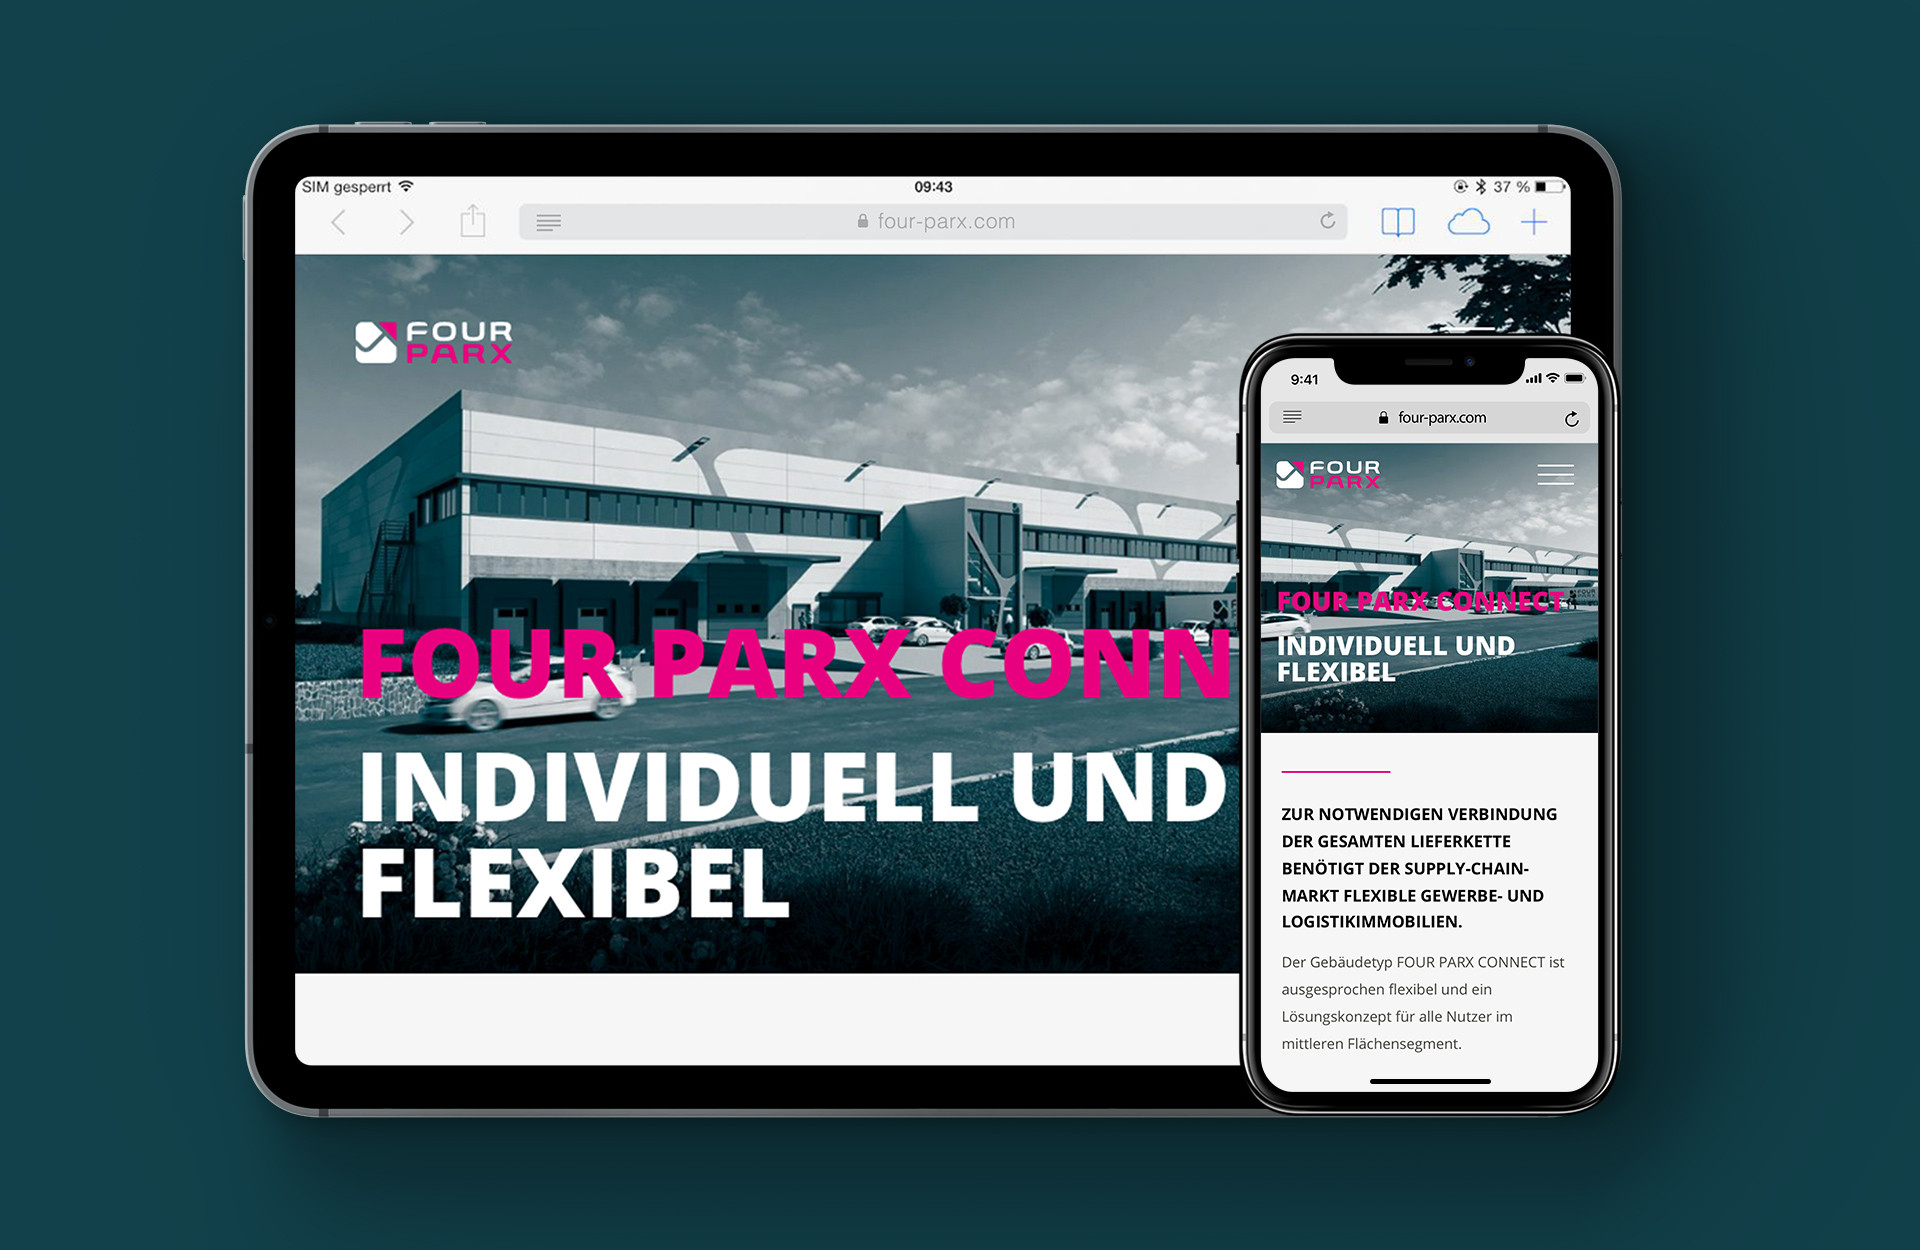 FourParx_iPad-Pro-2018_&_IPhone_X.jpg